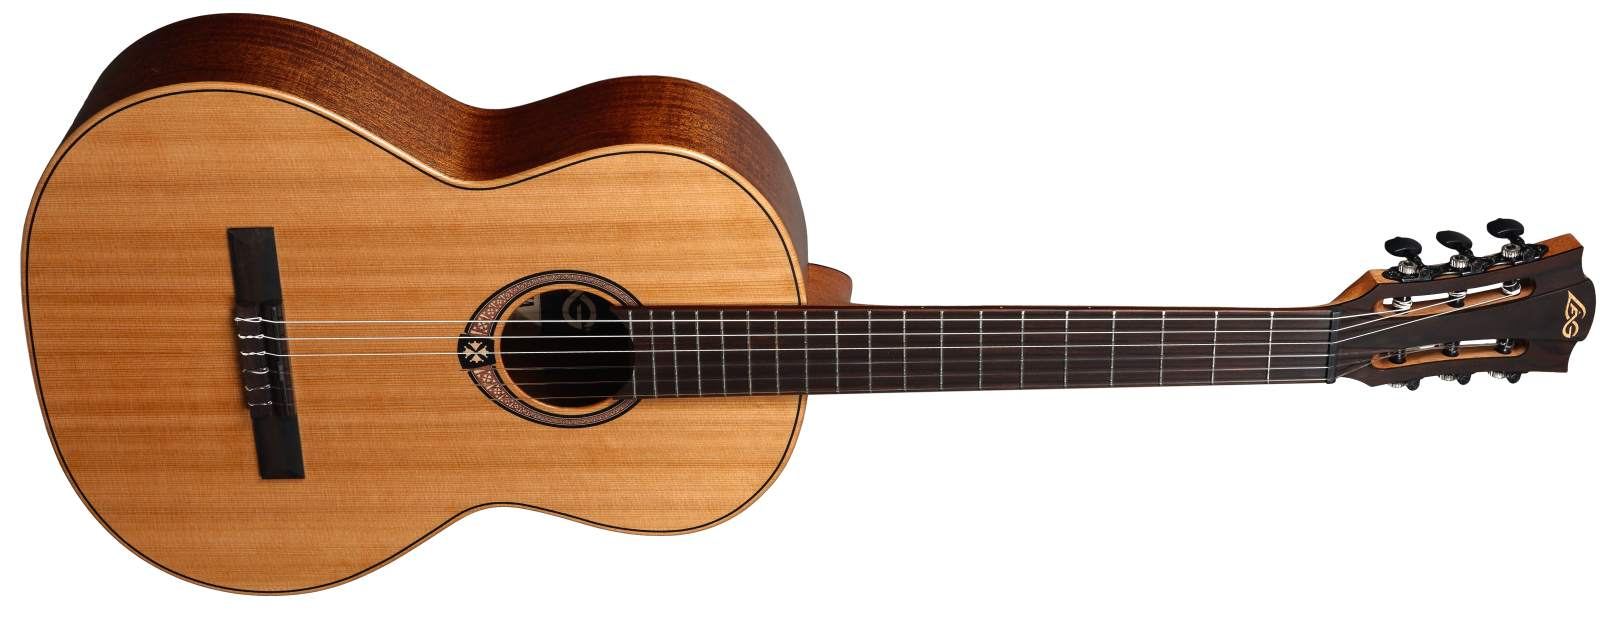 LAG OC170 Konzertgitarre Occitania 170